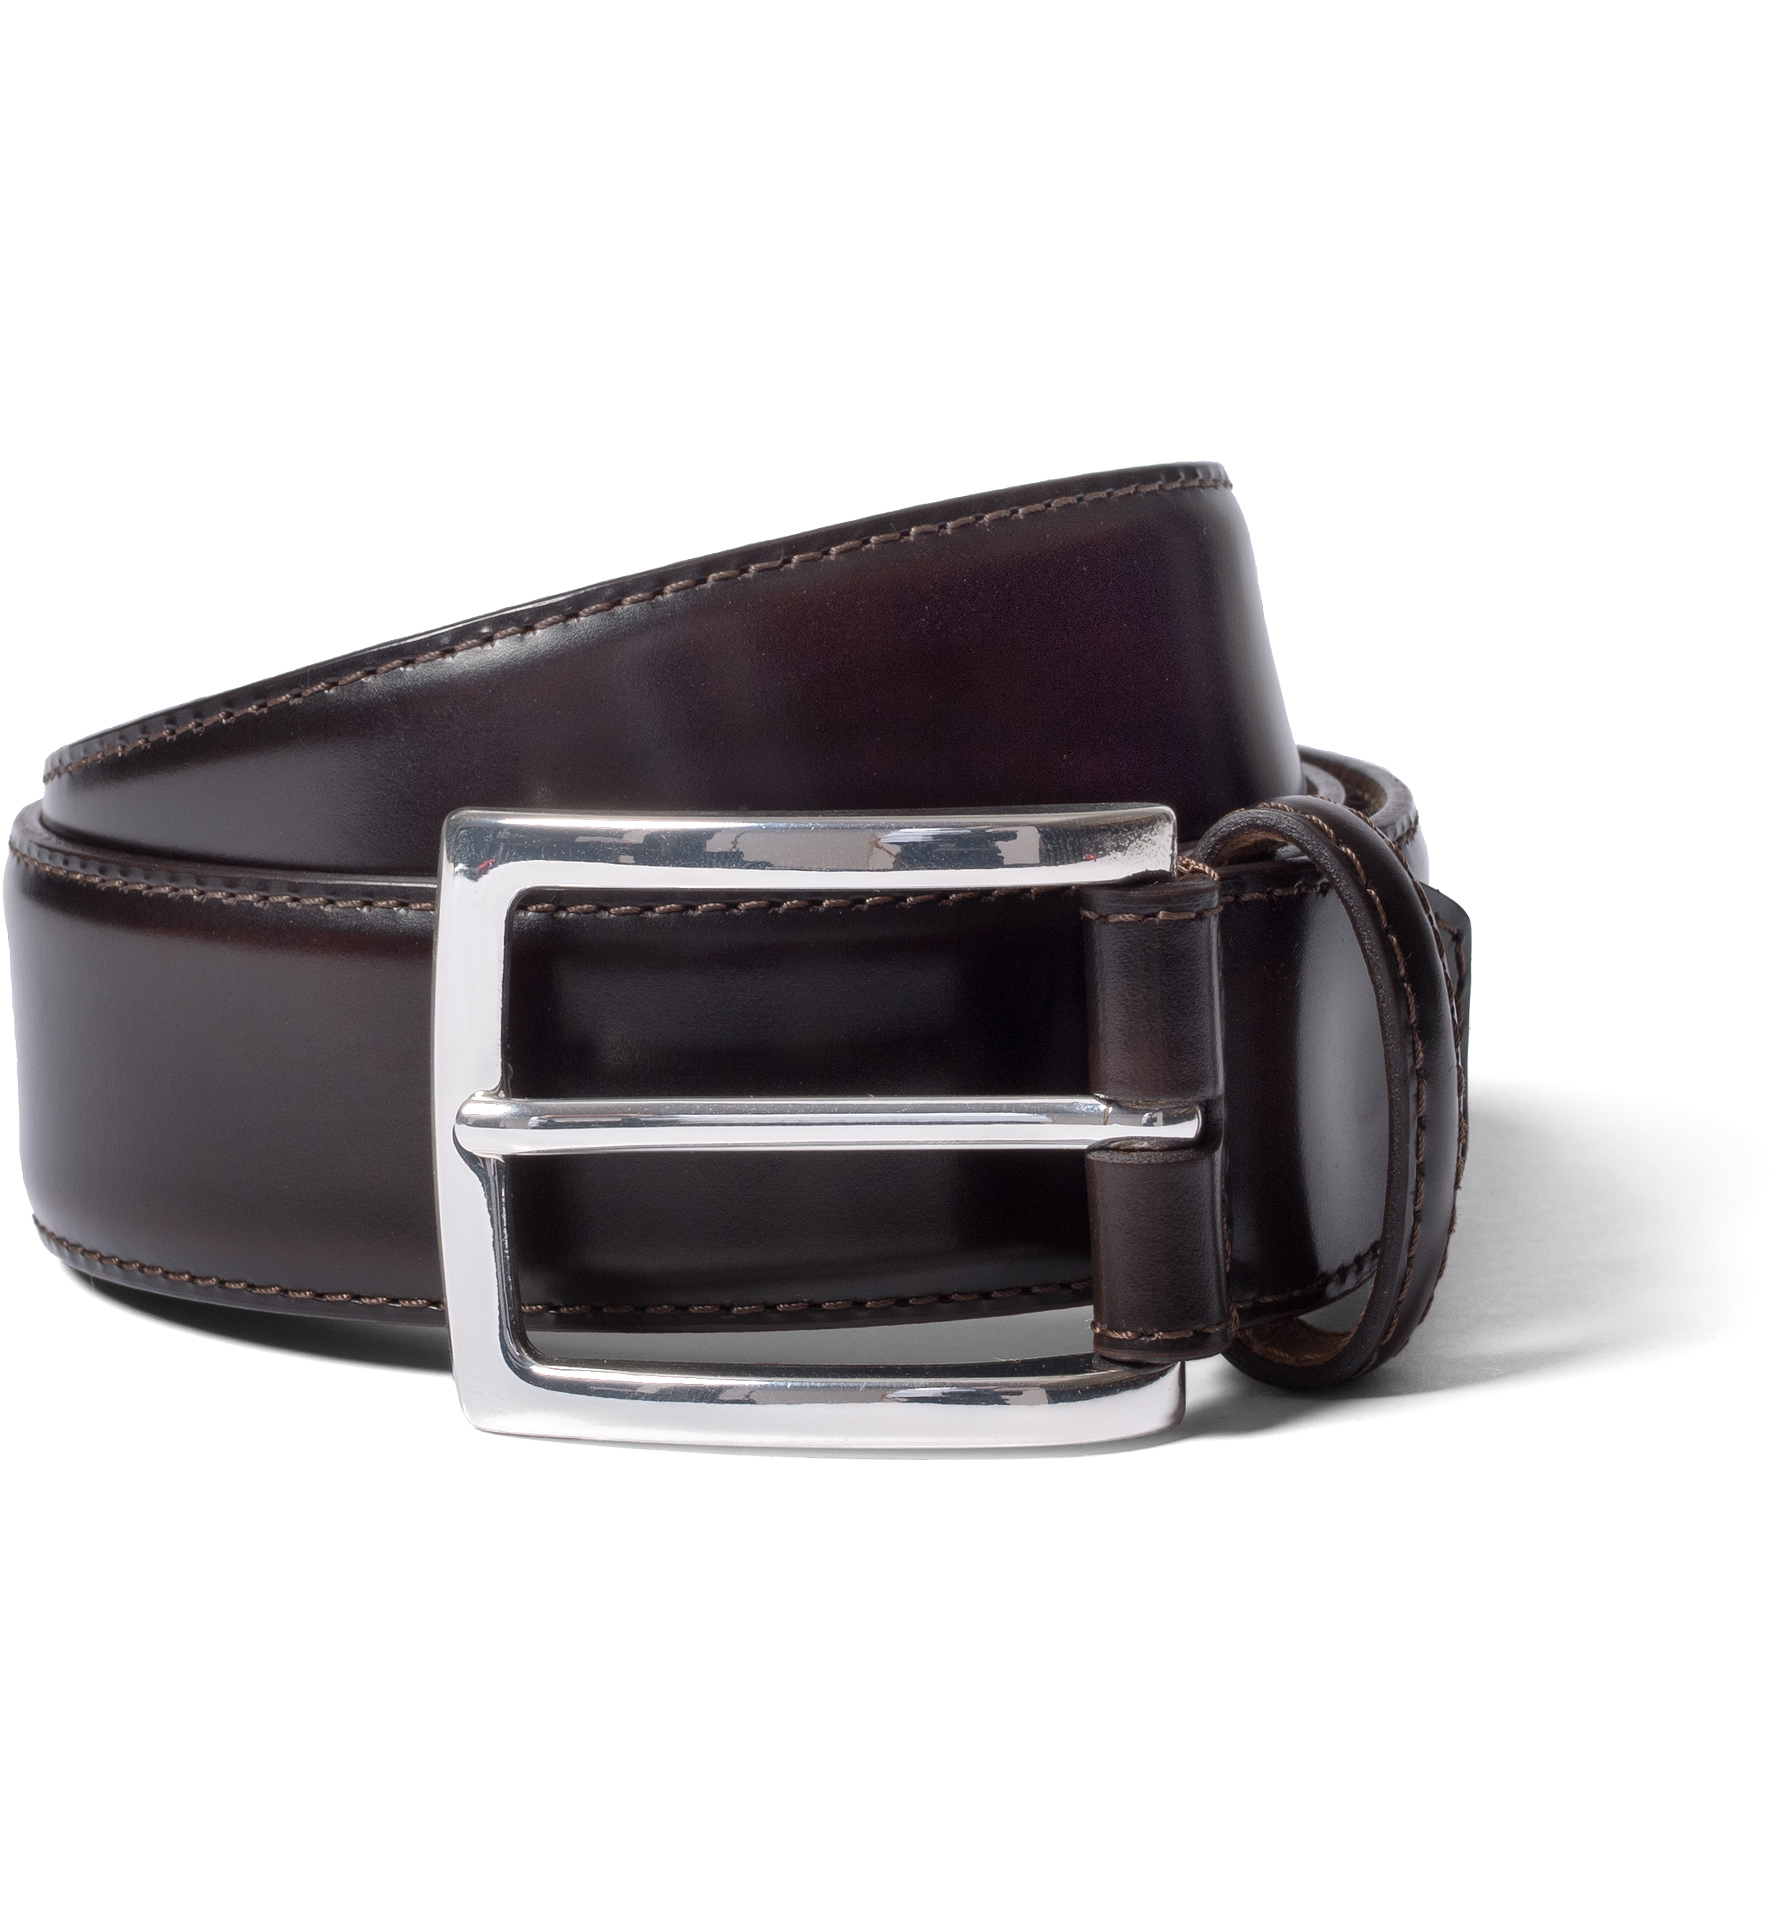 Zoom Image of Dark Brown Cordovan Belt